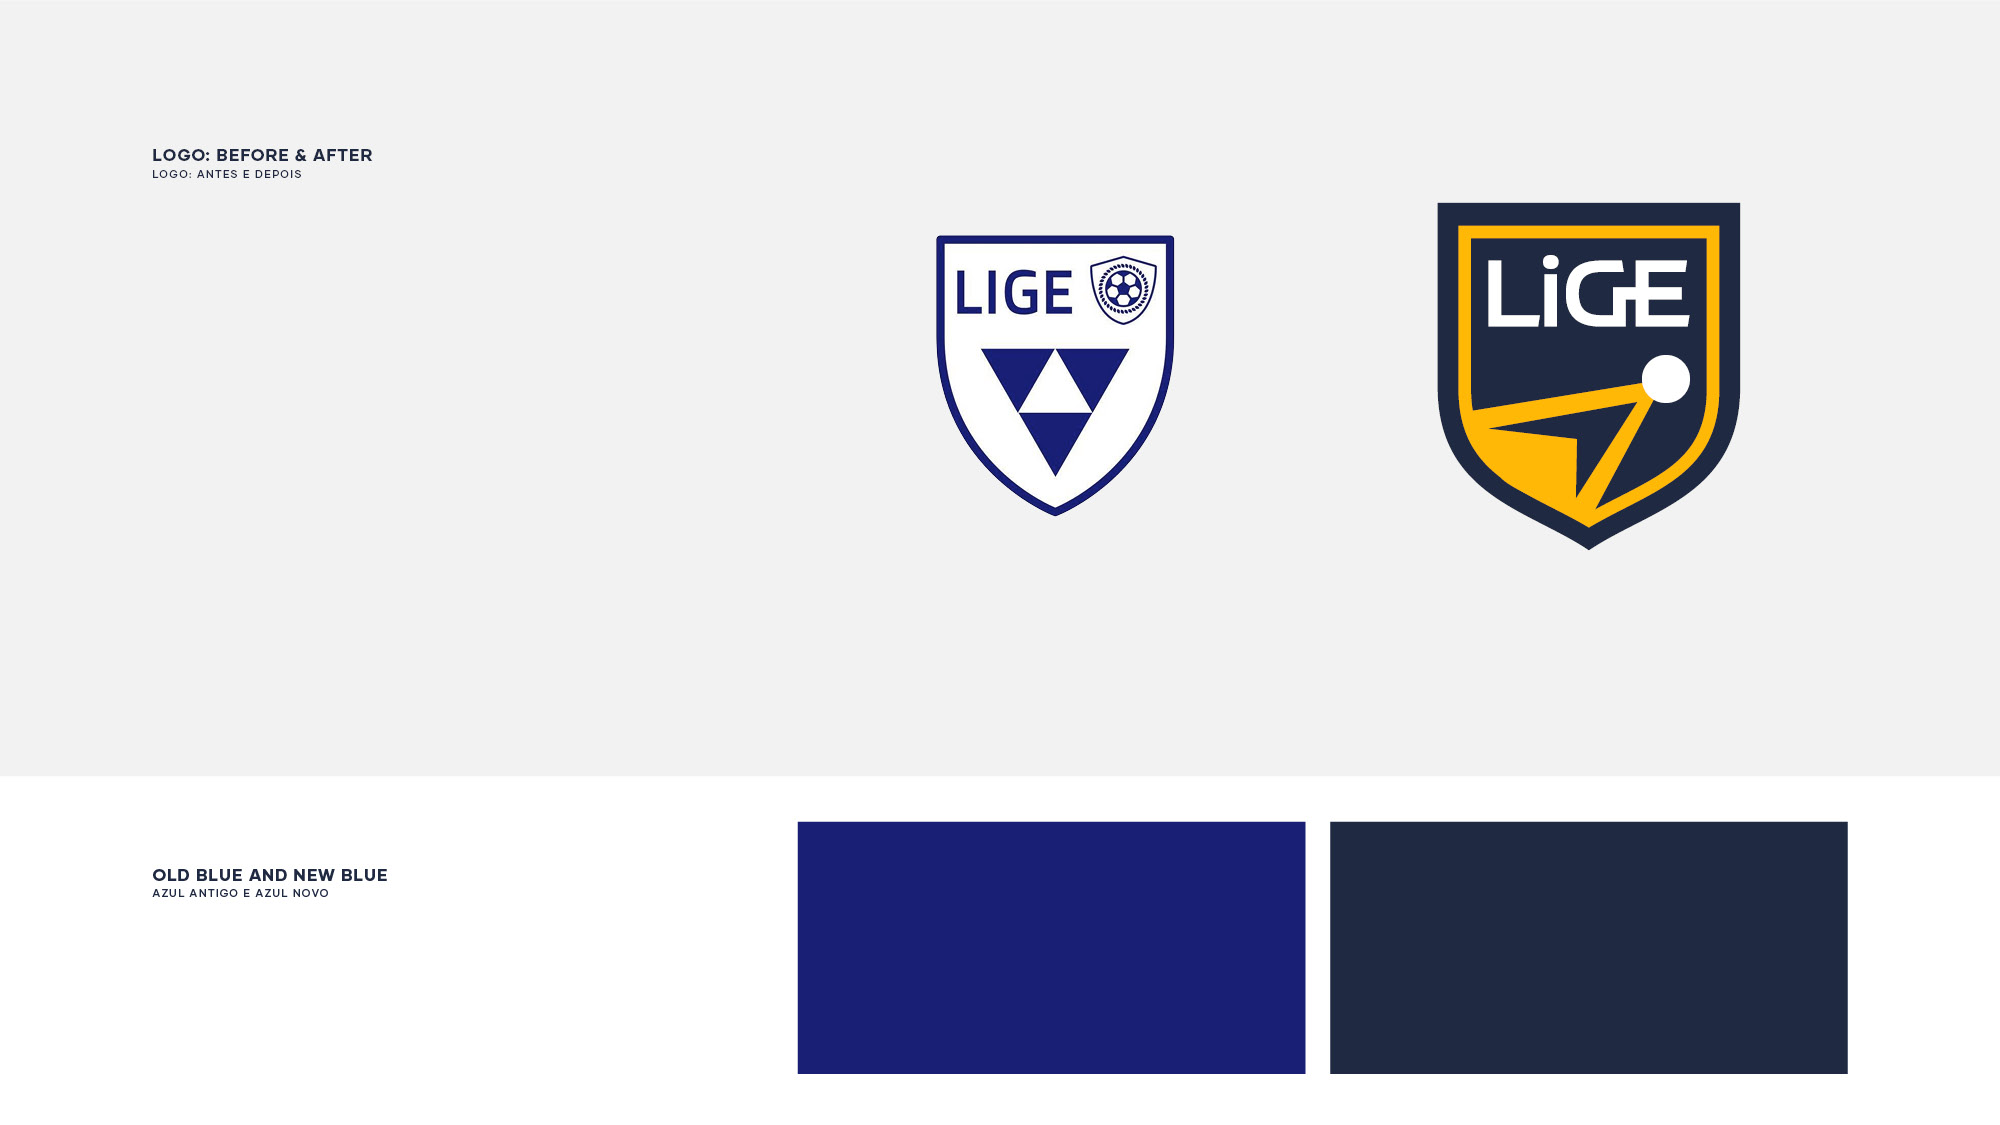 Lige-FGV-SP-Nacione-Branding2